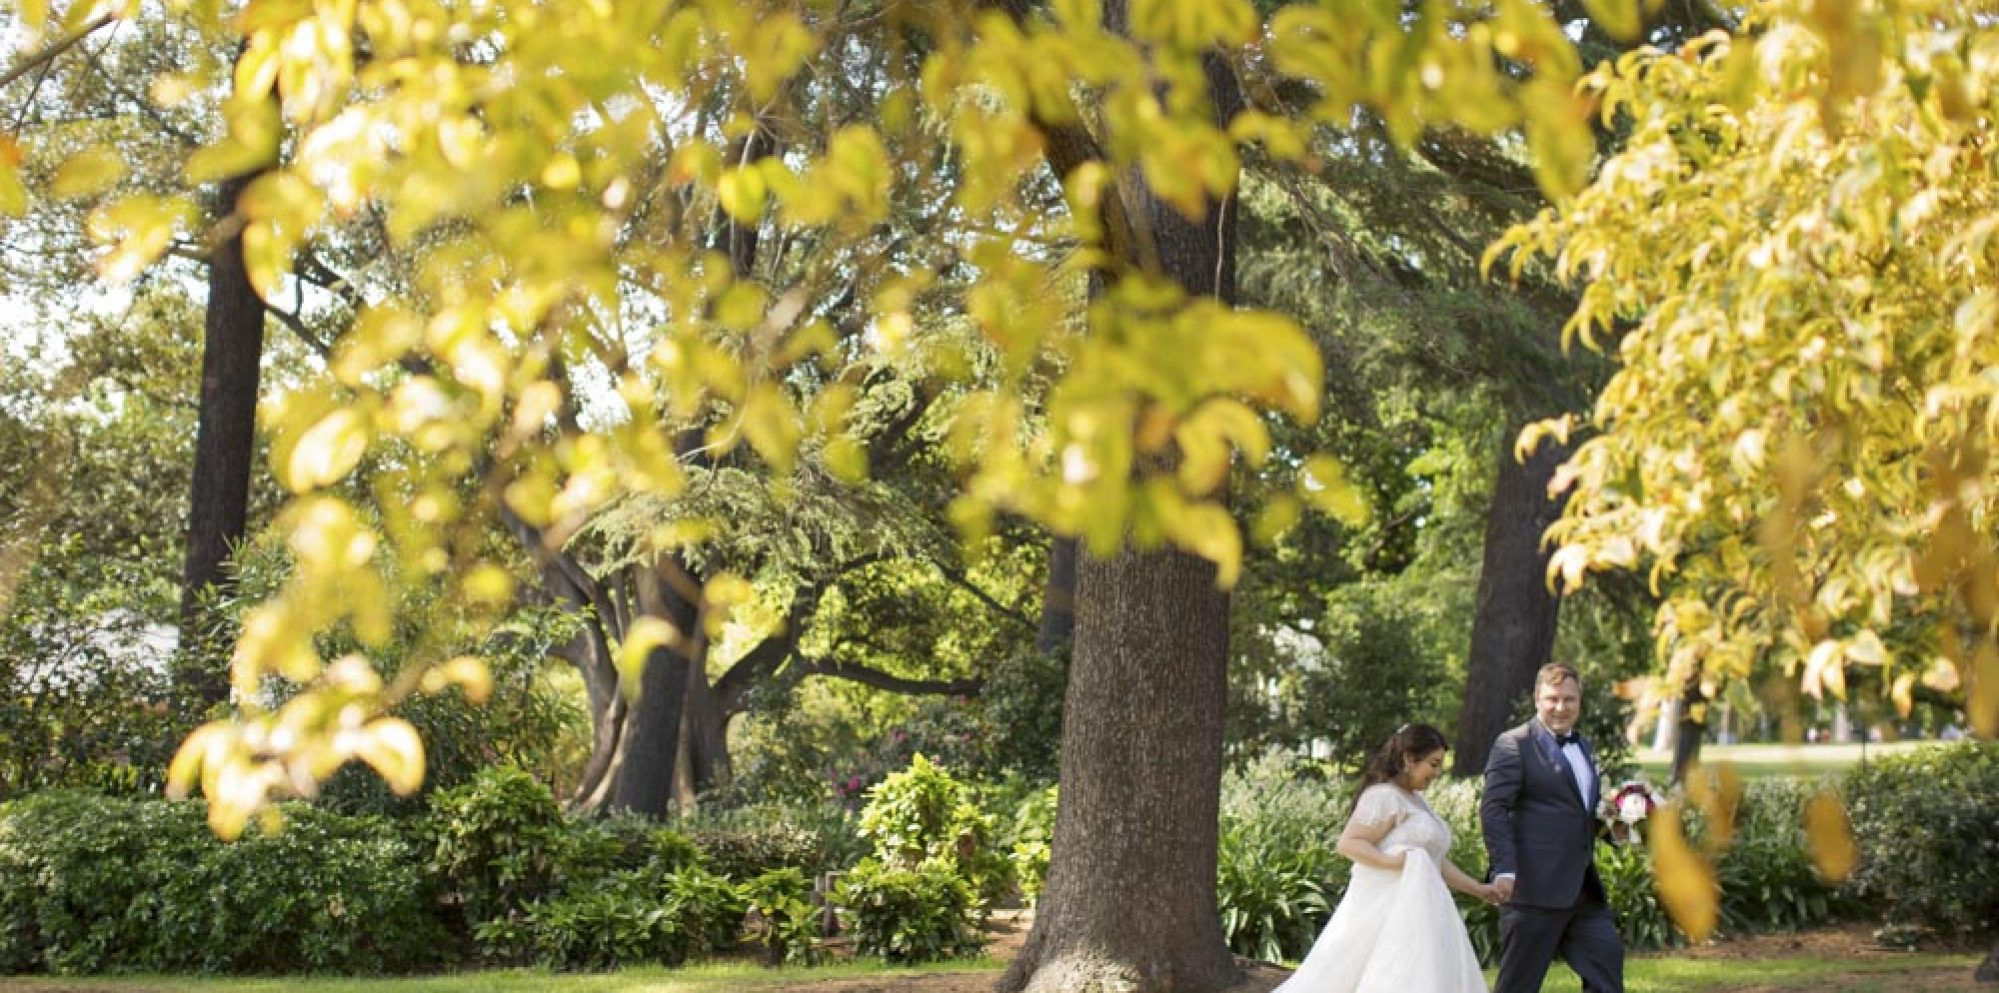 Evie & milan |  st sava serbian orthodox church & happy receptions wedding photography melbourne